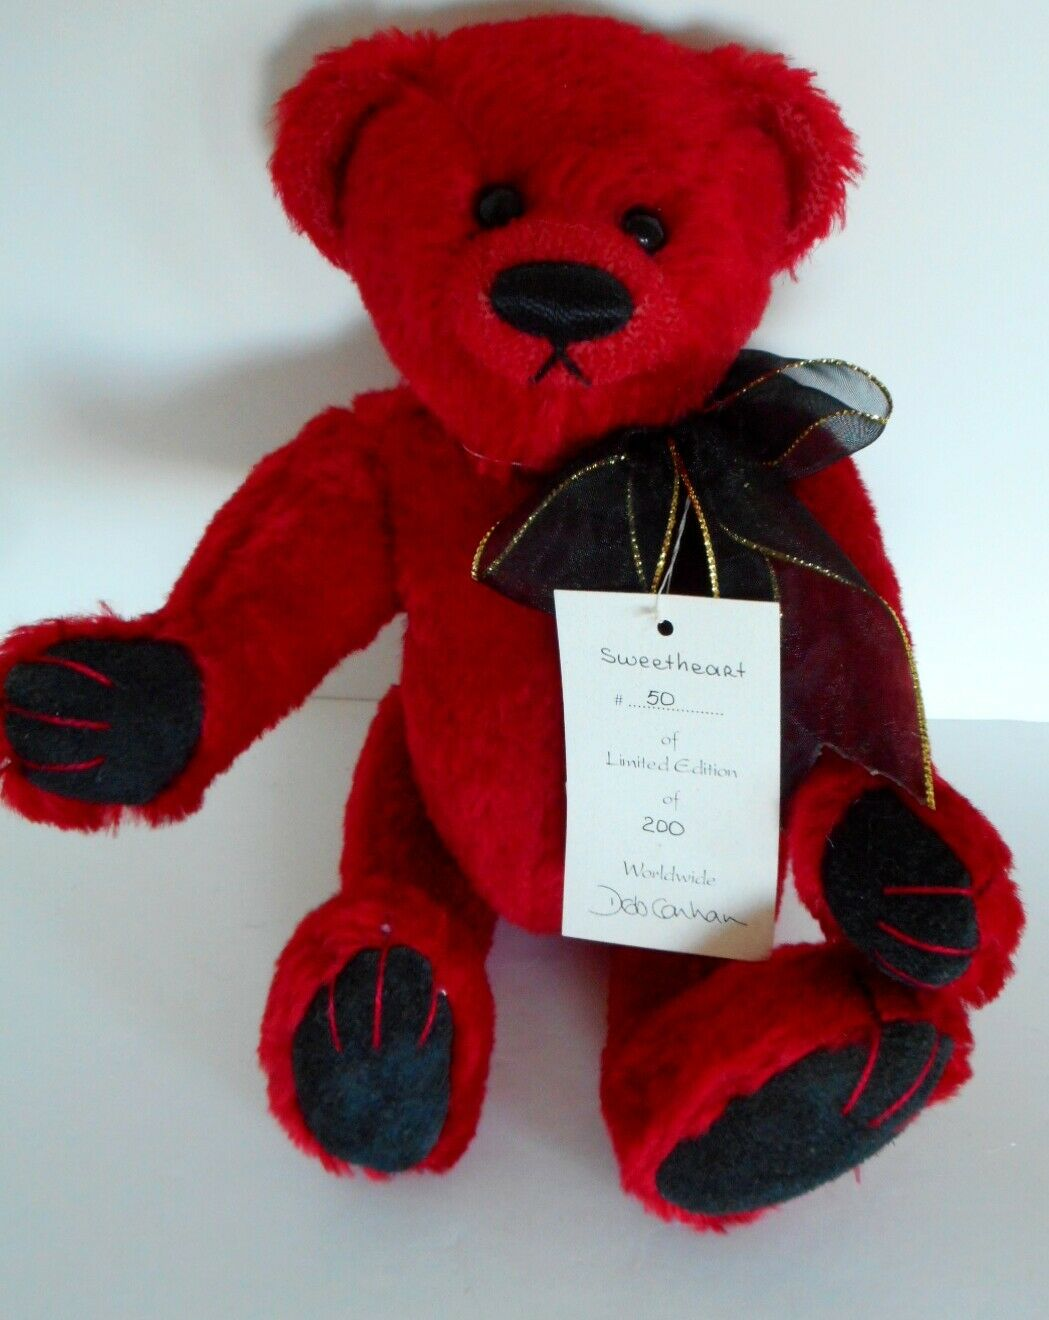 Deb Canham Bigger Bear  Sweetheart , 11 Inches, Jointed MWT 50 200